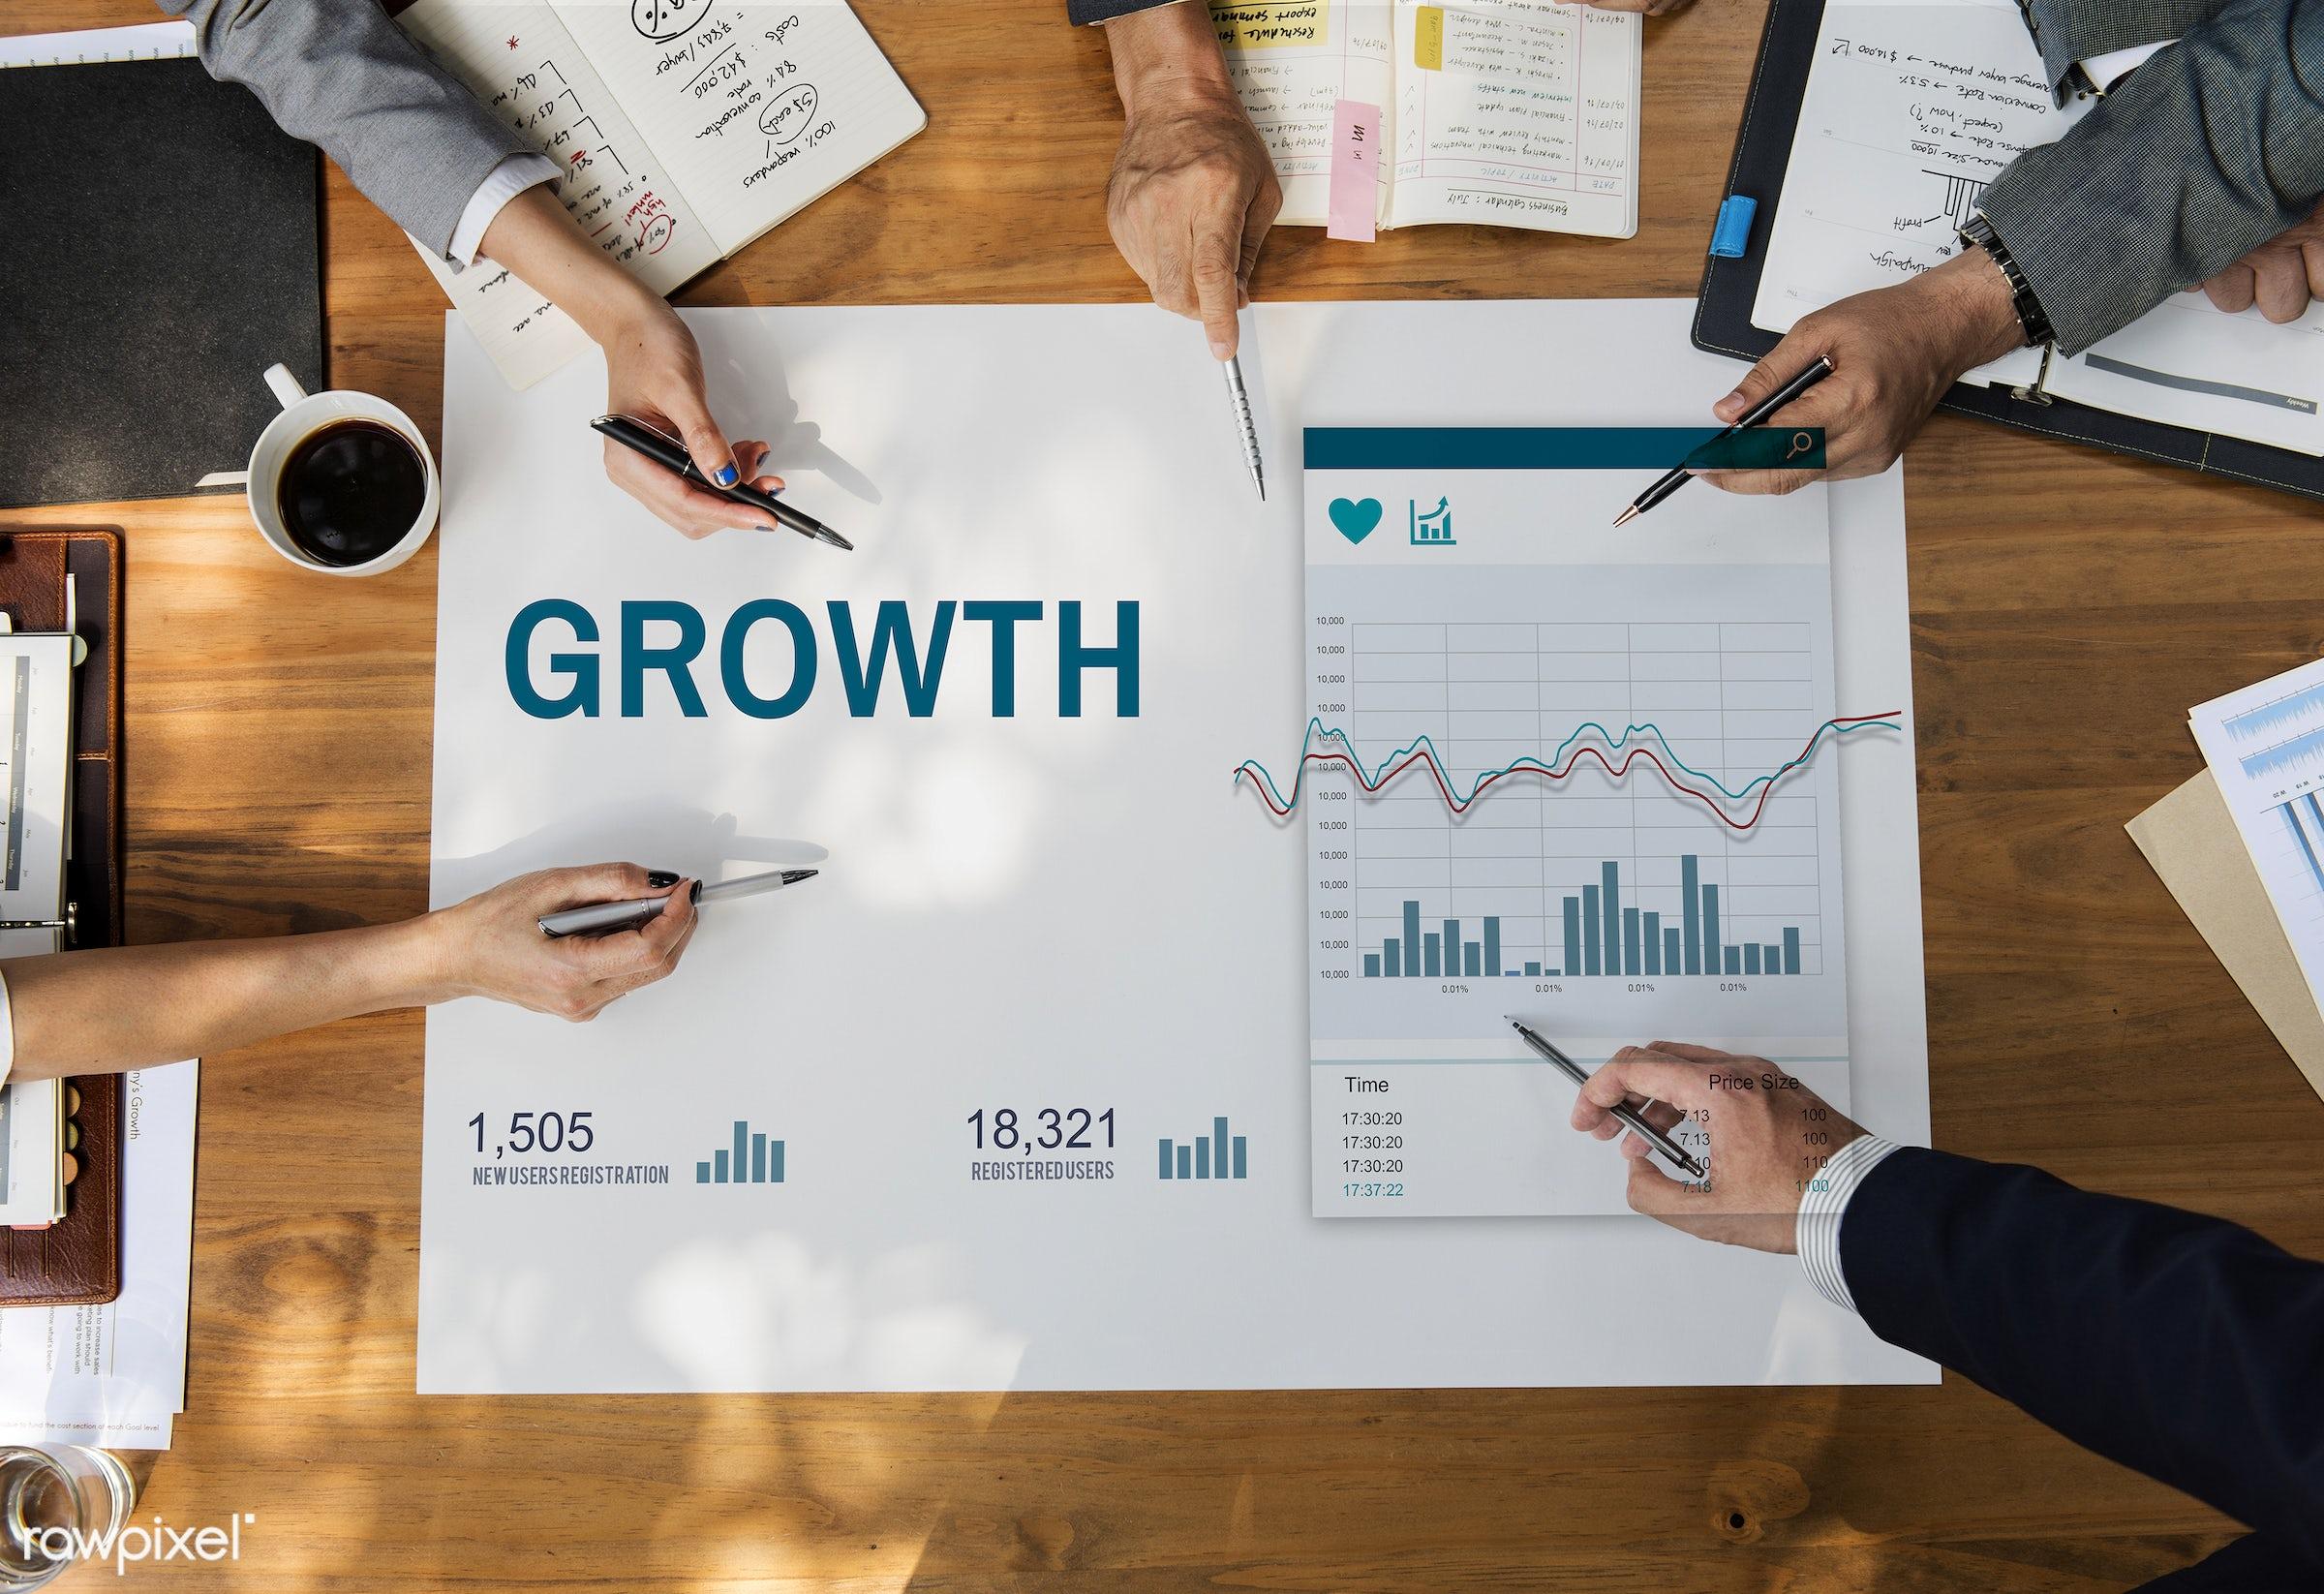 development, aim, analysis, asian, brainstorming, business, businessmen, businesswomen, connection, devices, digital,...